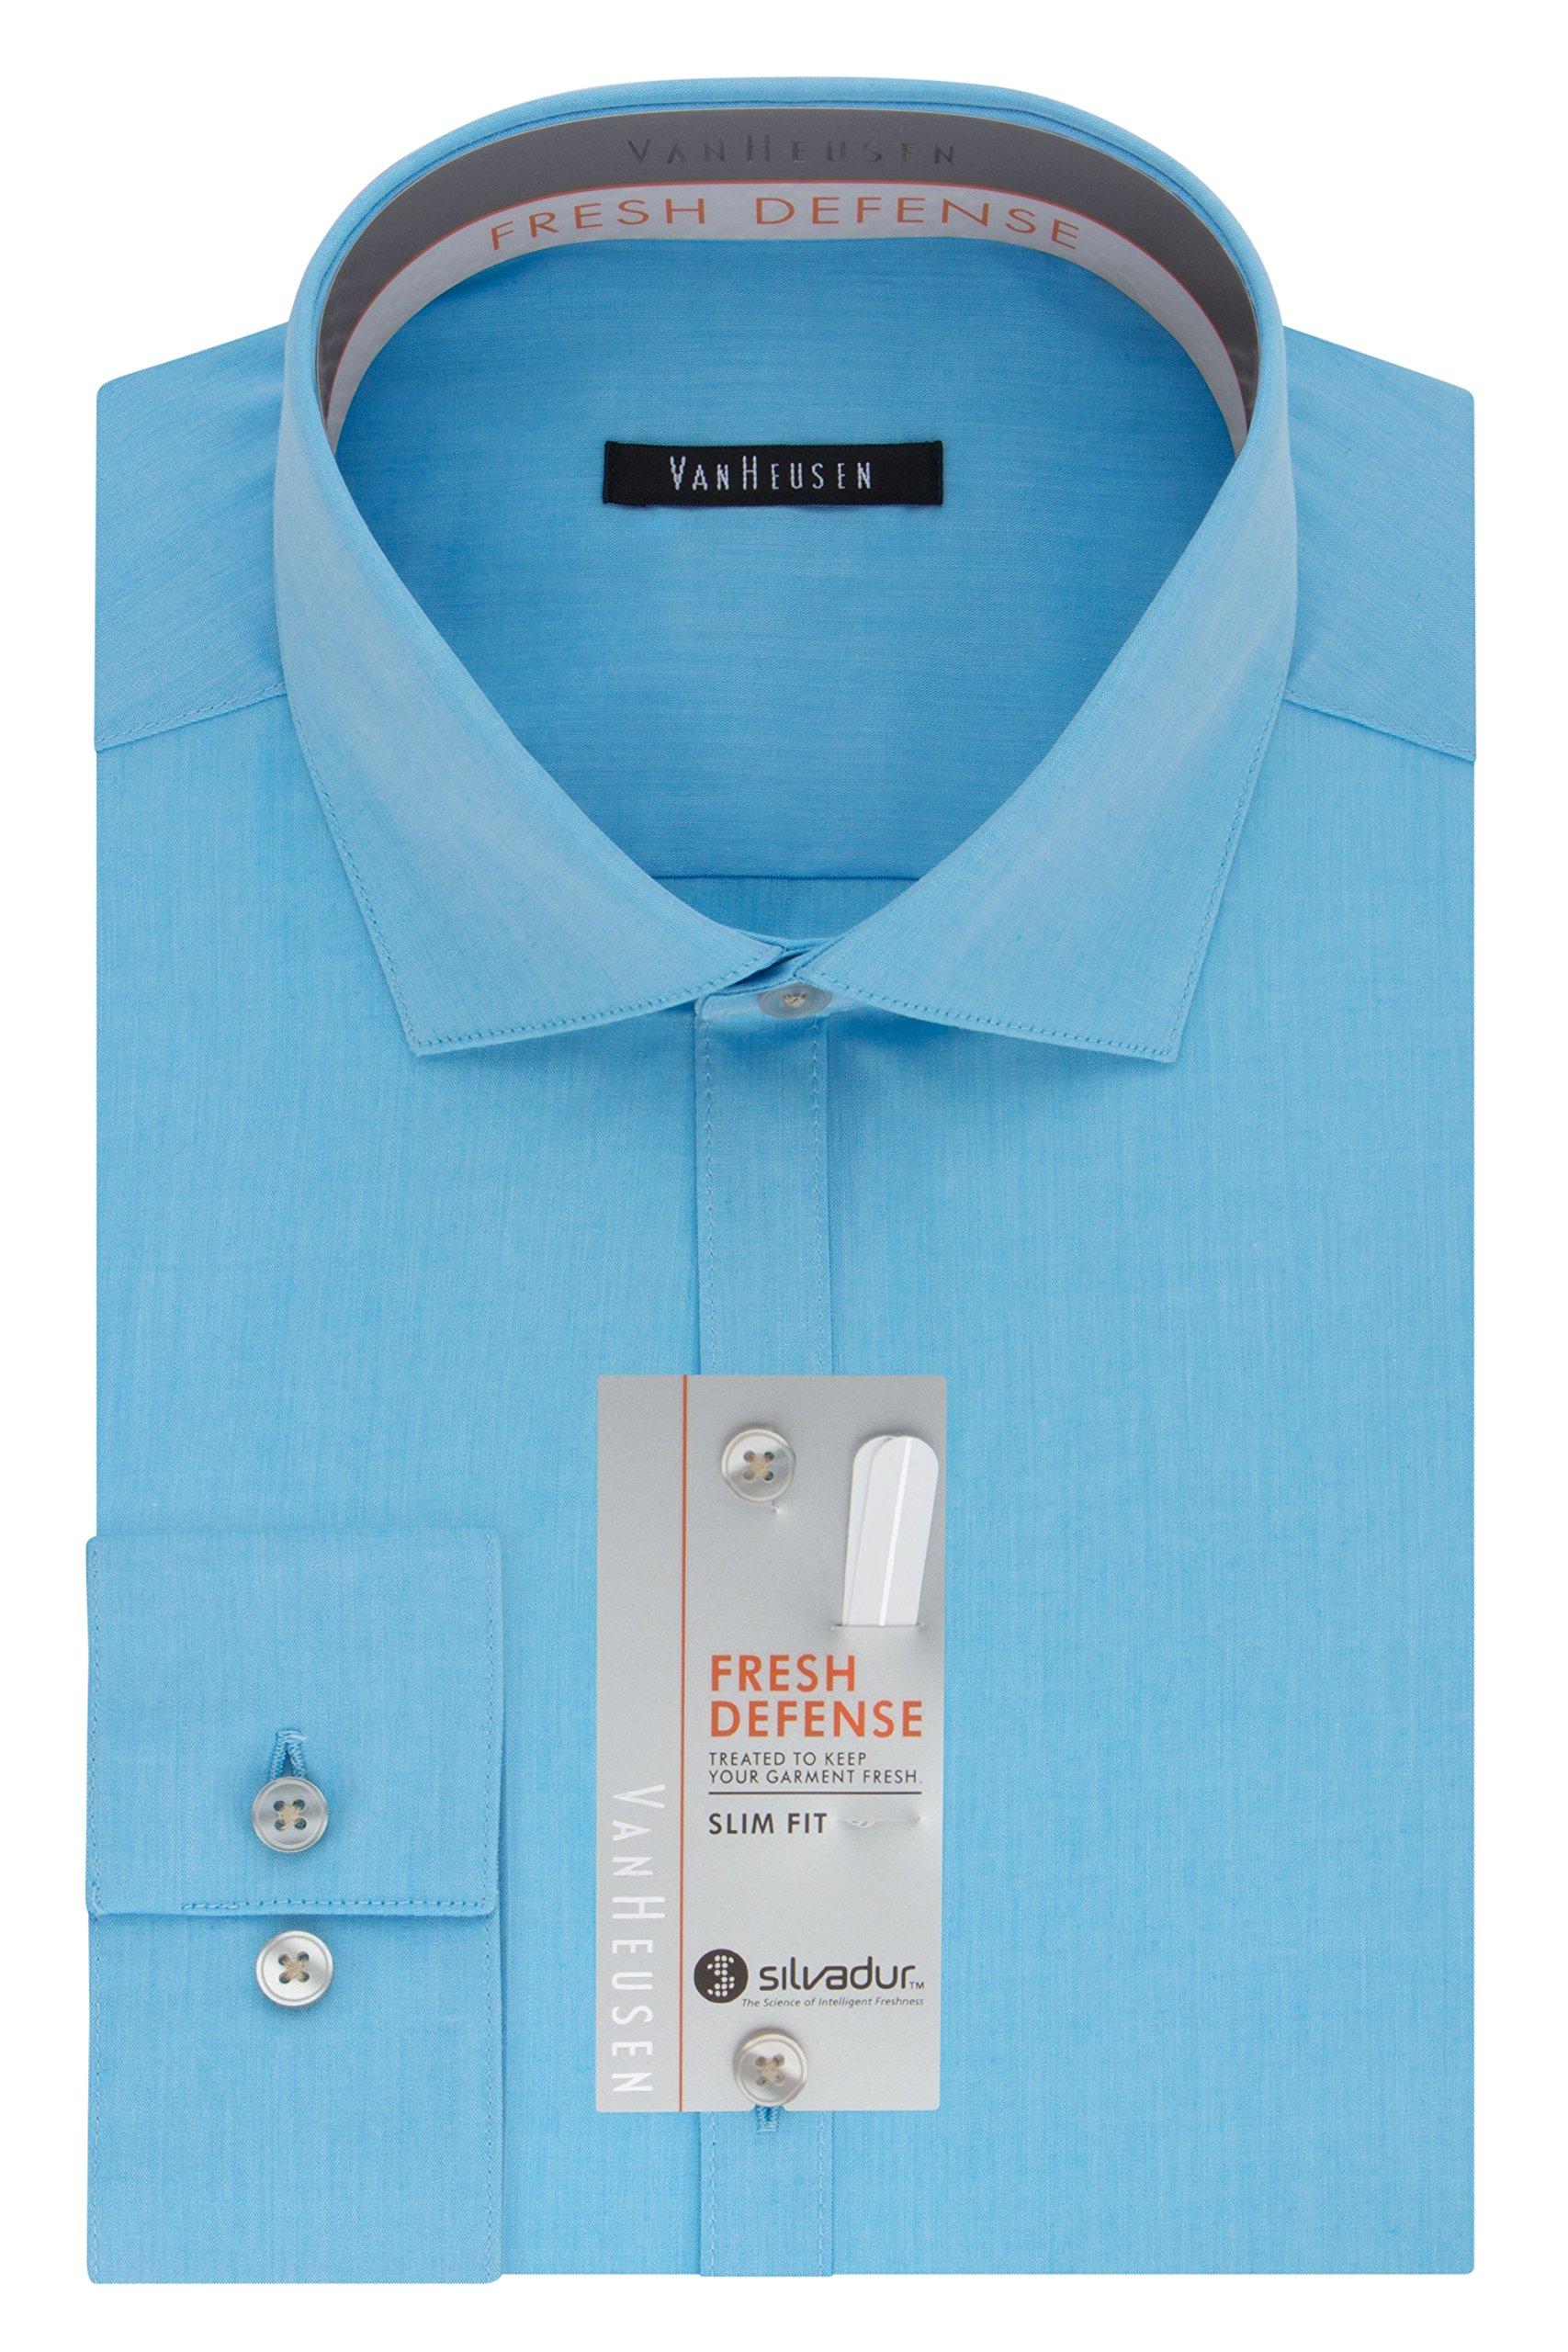 Van Heusen Men's Chrome Slim Fit Solid Spread Collar Dress Shirt, Aquamarine, 16.5'' Neck 34''-35'' Sleeve